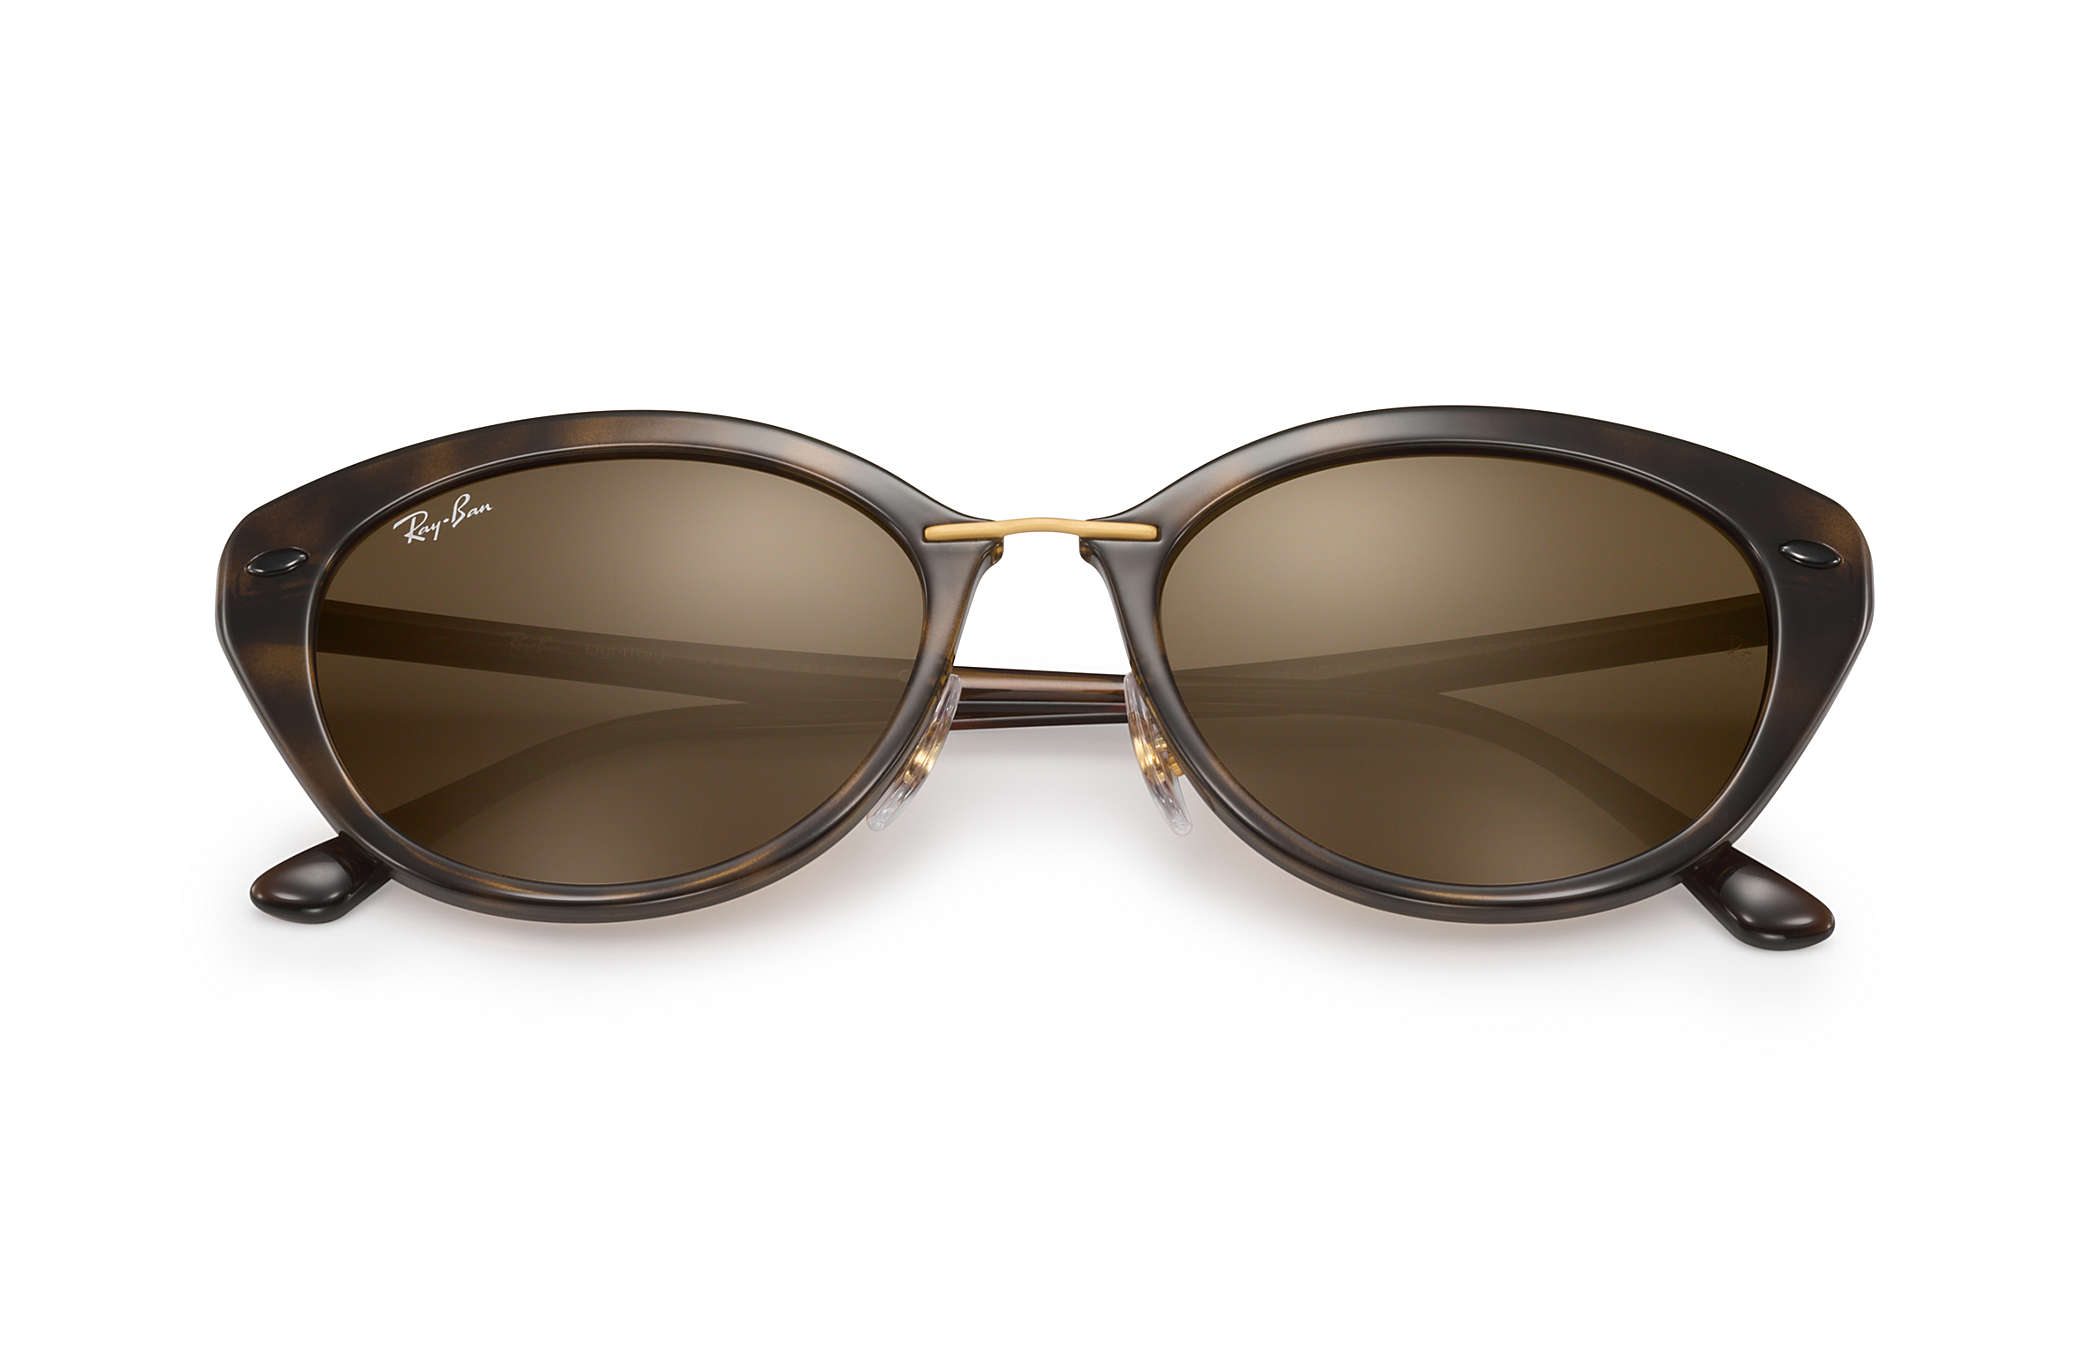 ed25b6139fc Ray-Ban RB4250 Tortoise - LightRay Titanium - Brown Lenses ...